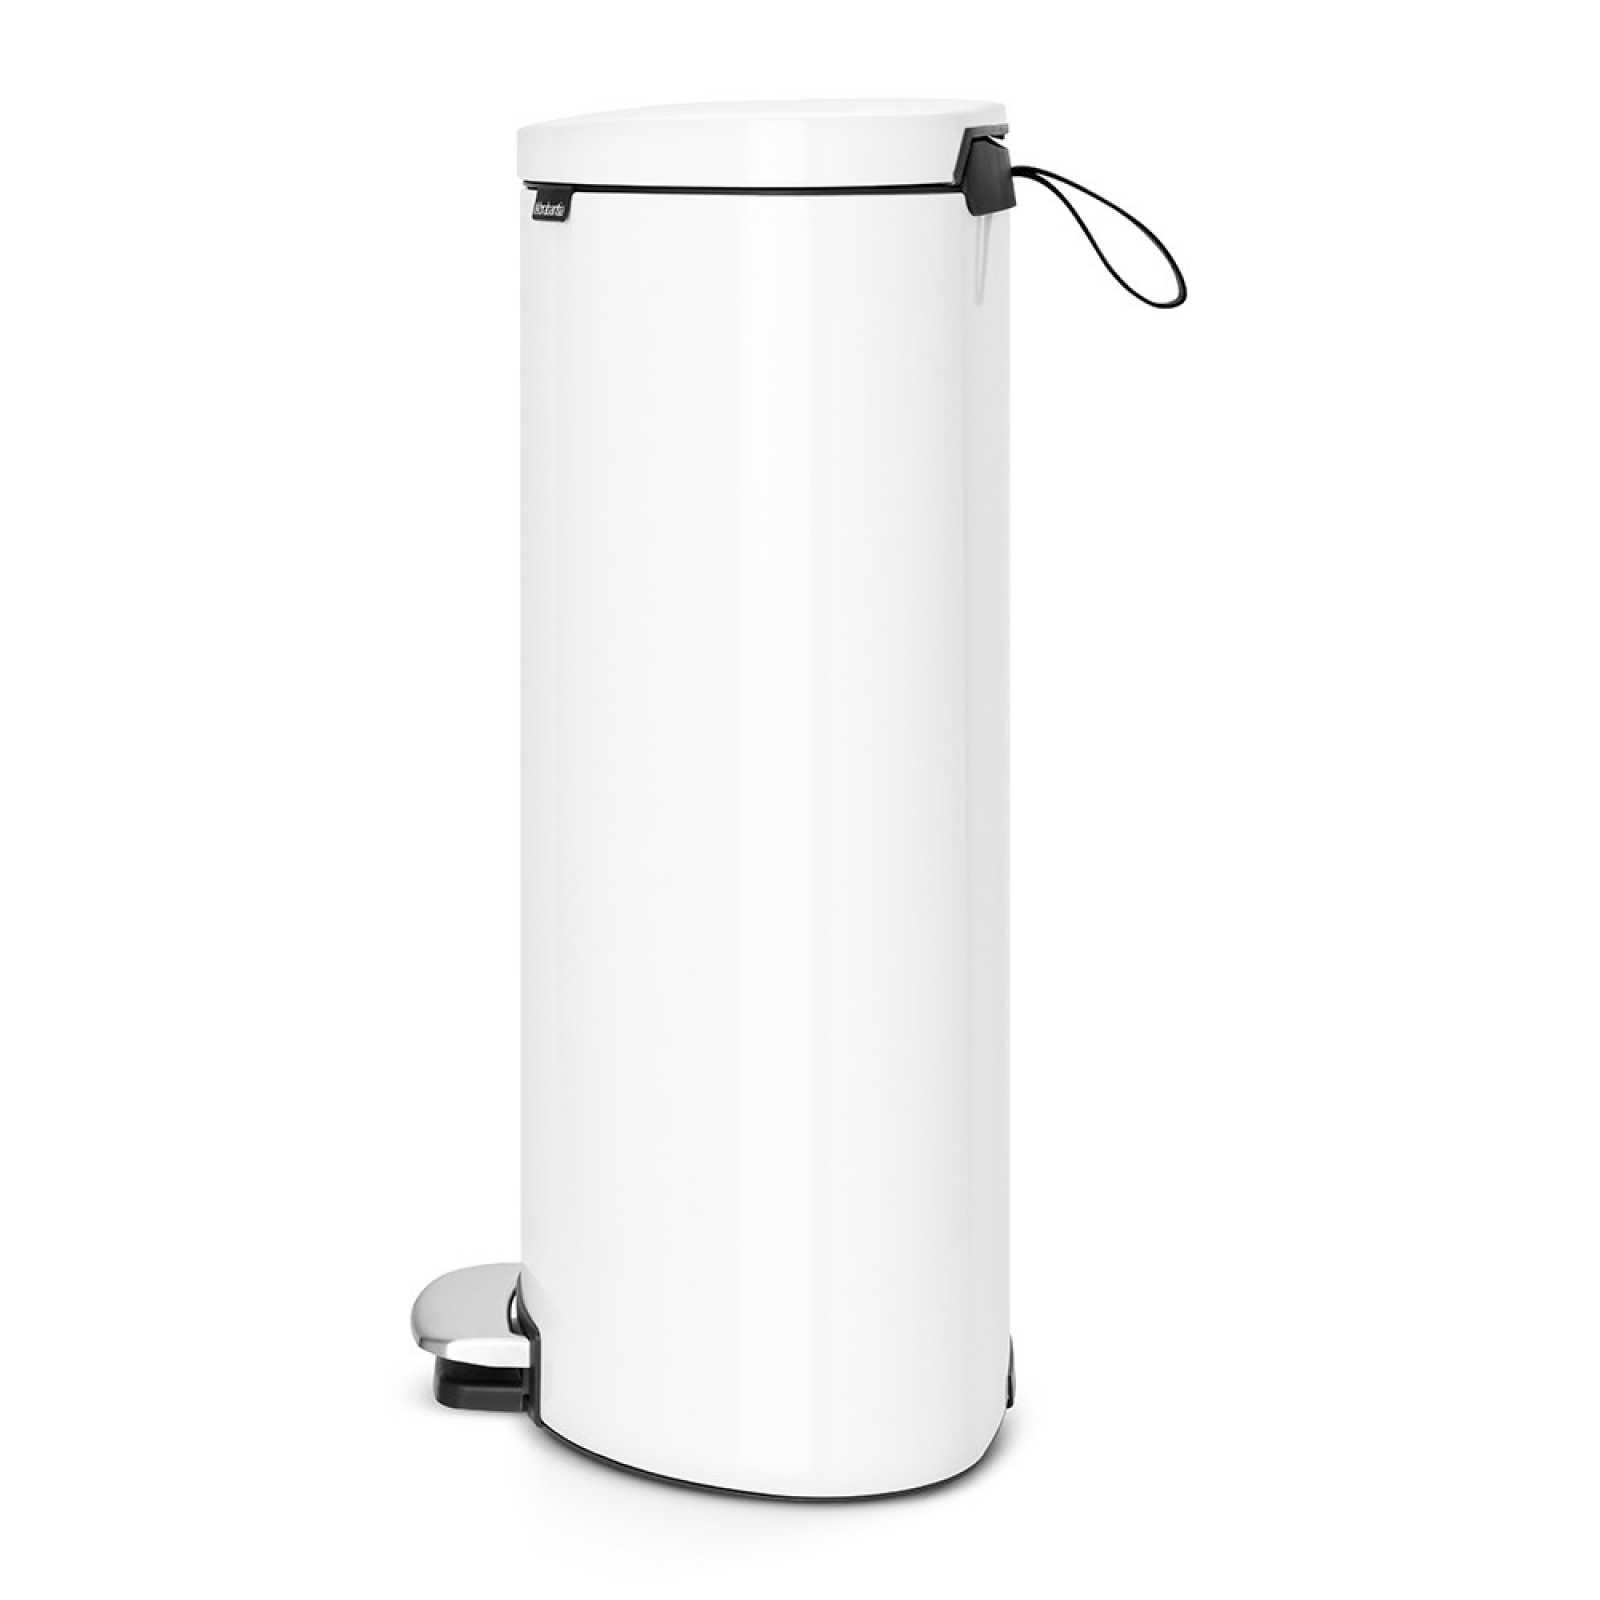 Онлайн каталог PROMENU: Бак для мусора с педалью Pedal Bin Brabantia, объем 30 л, белый Brabantia 485206